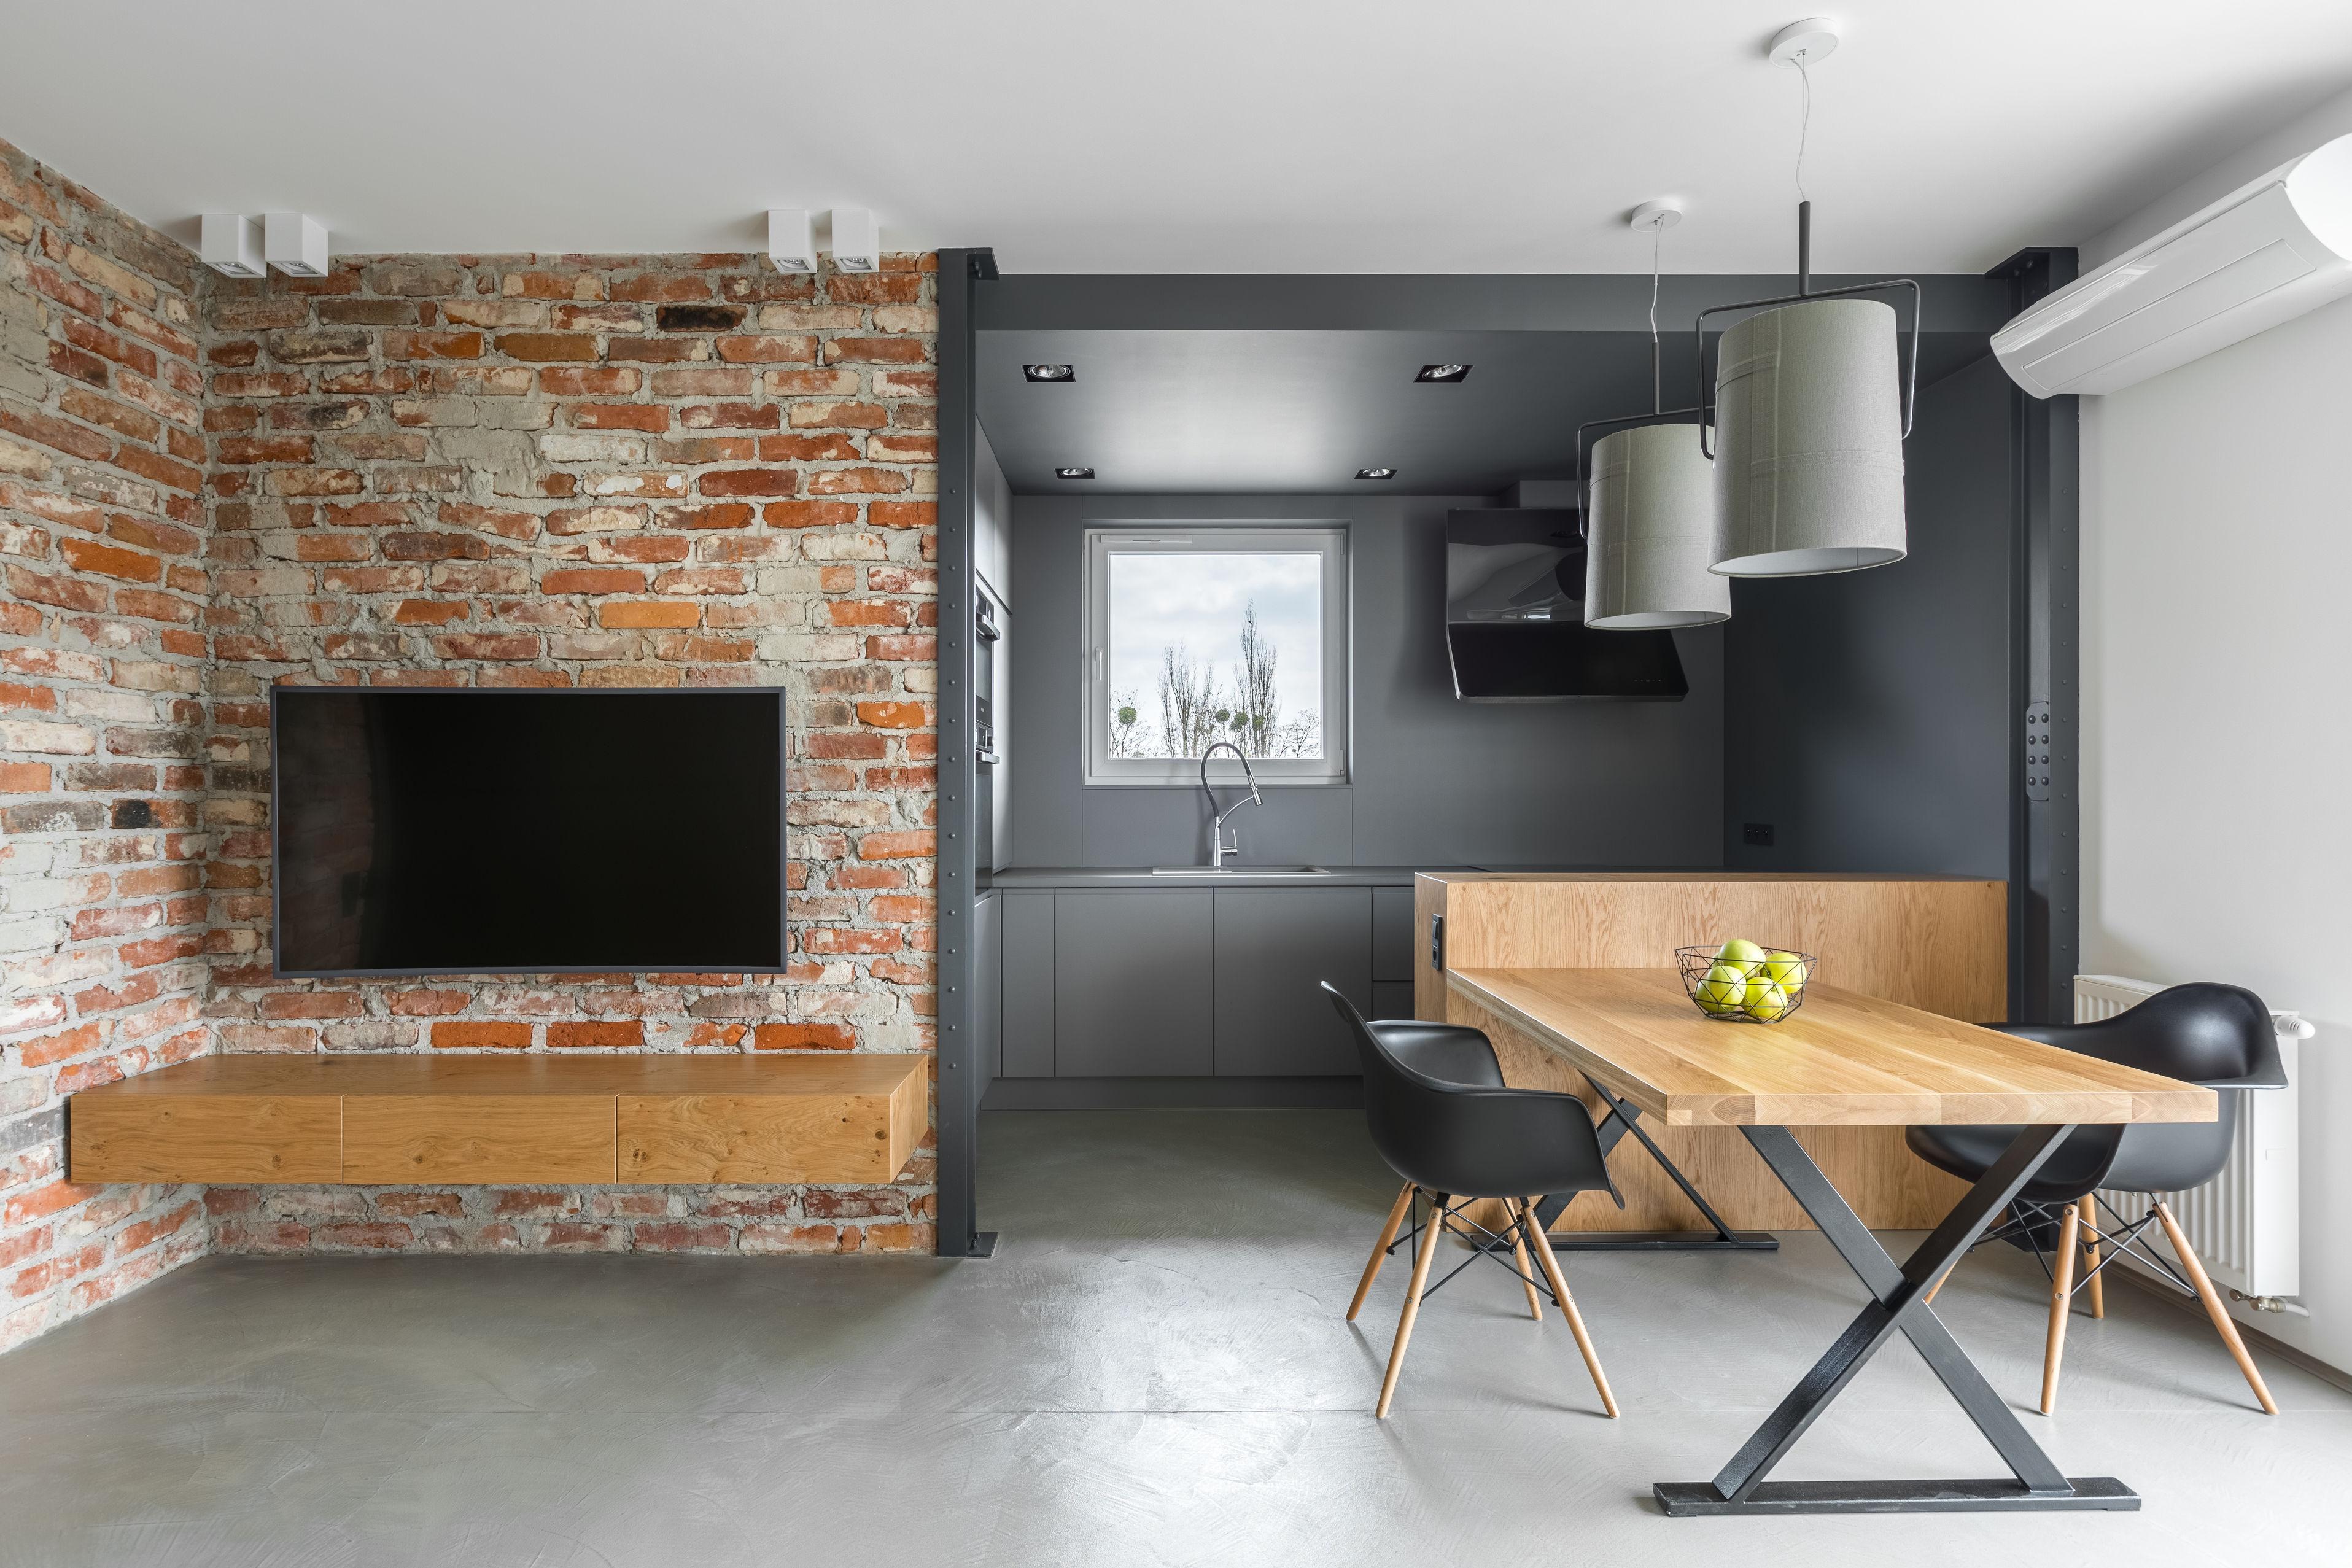 Best Tapis Style Industriel Images - House Design - mapetitesouris.info